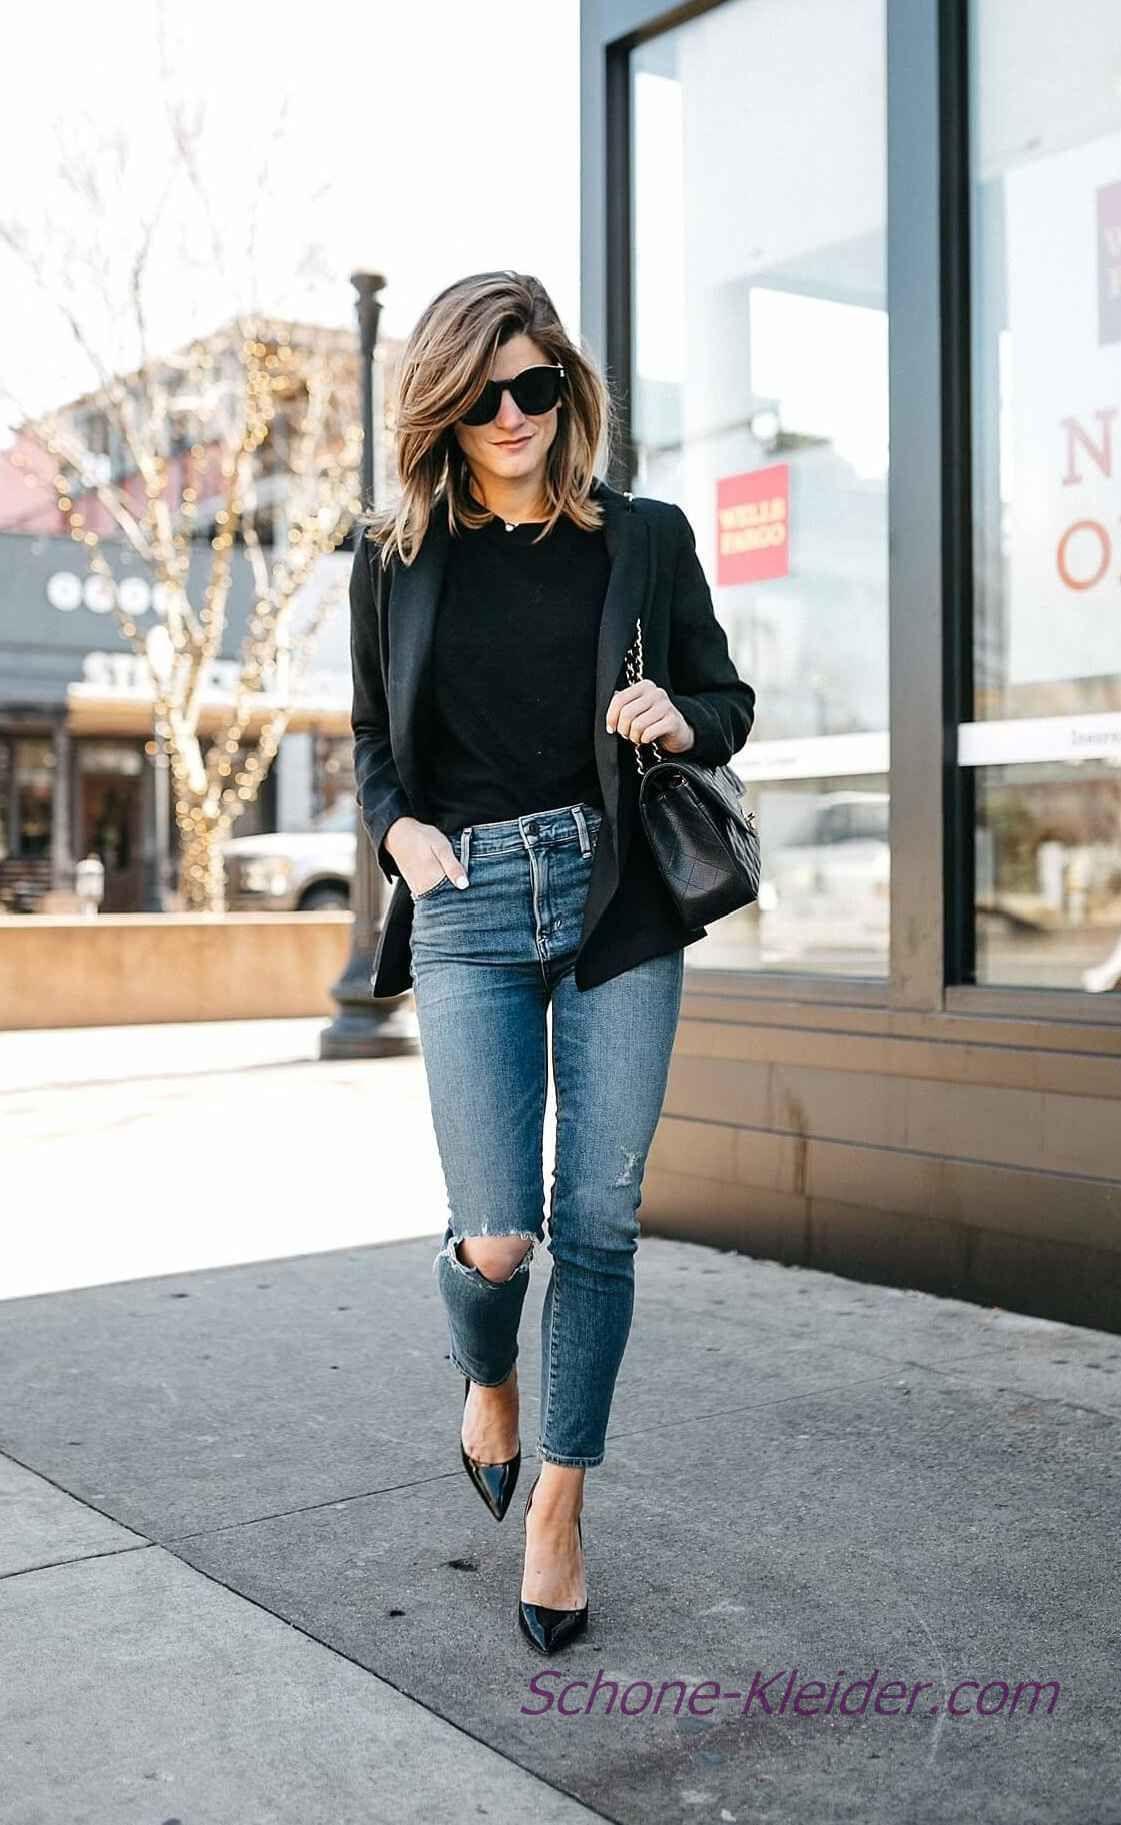 d7874dc13bf8 2019 Herbst Kleidung ist Perfekt Outfits für Jeden Tag | Pieces to ...